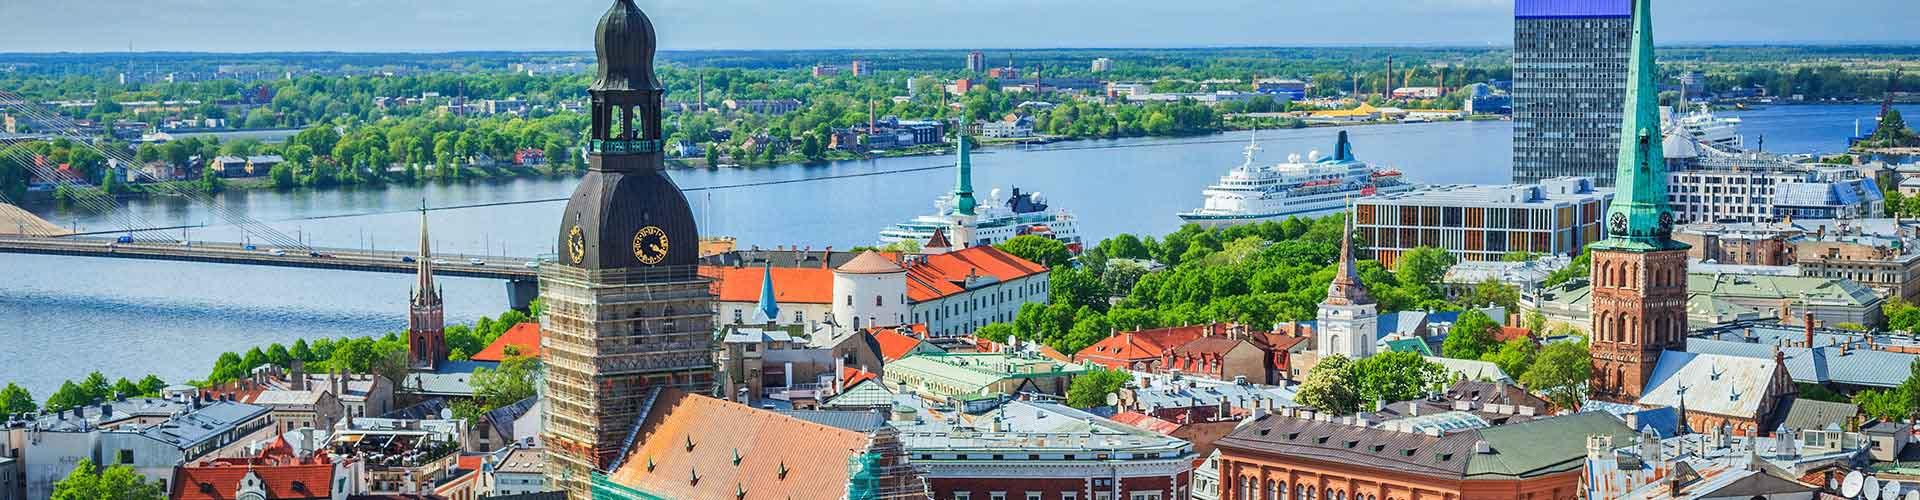 Riga - Hostelů v Riga. Mapy pro Riga, fotky a recenze pro každý hostel v Riga.